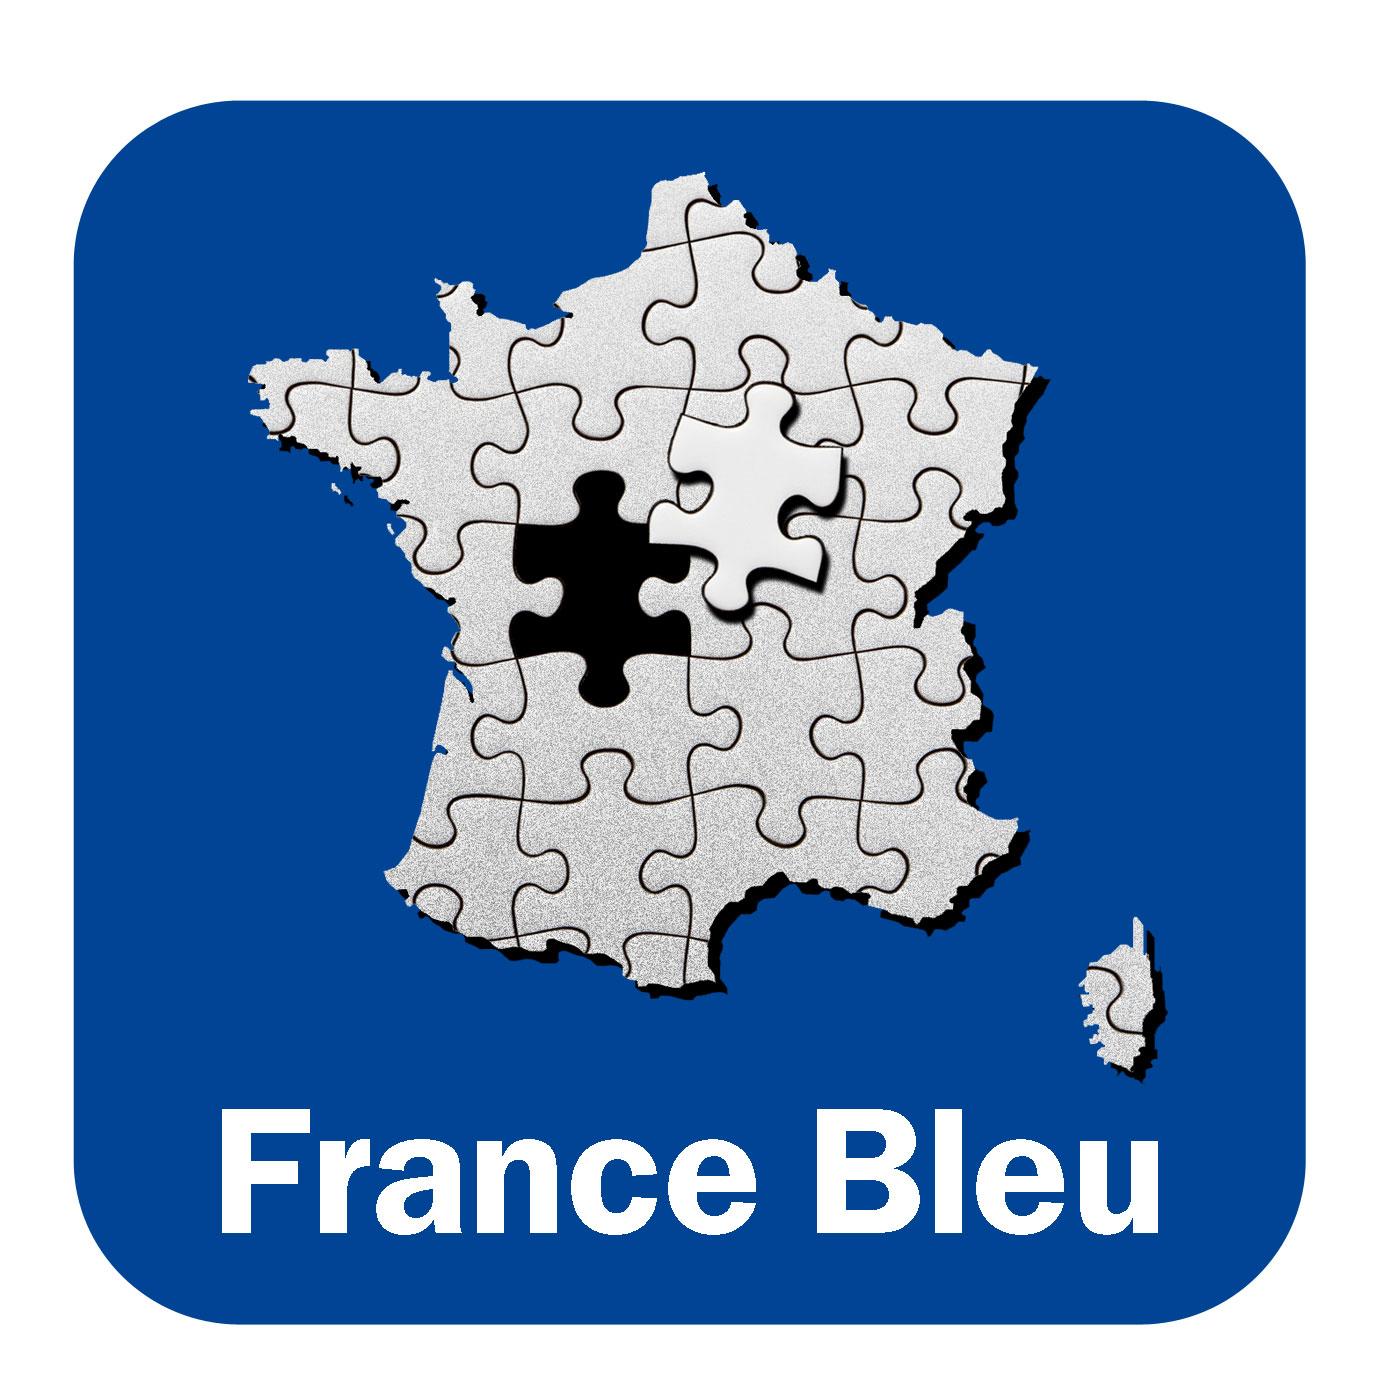 On cuisine ensemble dimanche France Bleu Mayenne